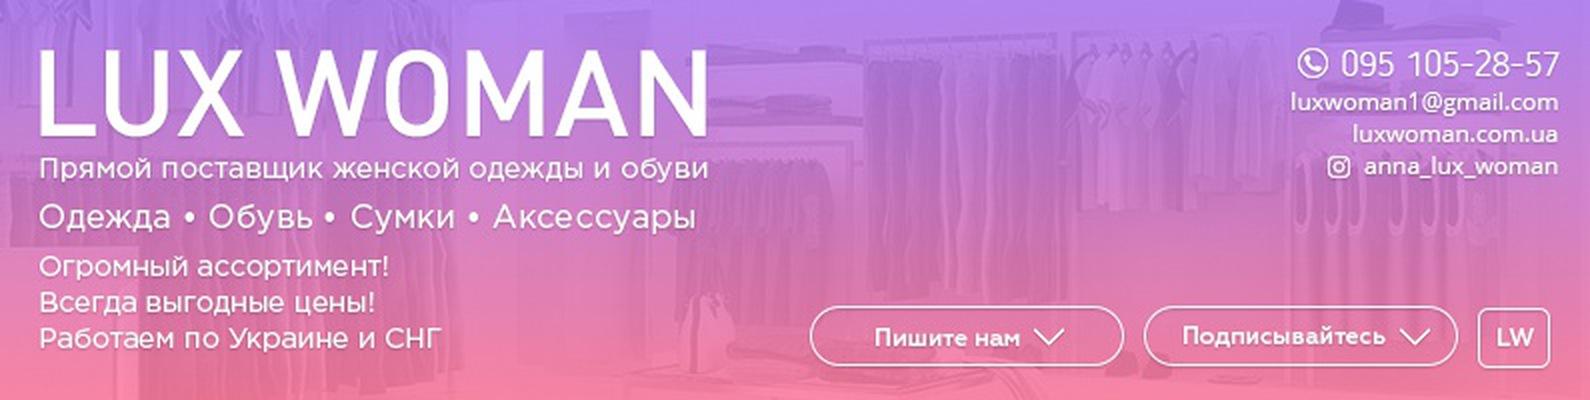 92fe7476081a Поставщик обуви, сумок, косметики | LUX WOMAN | ВКонтакте